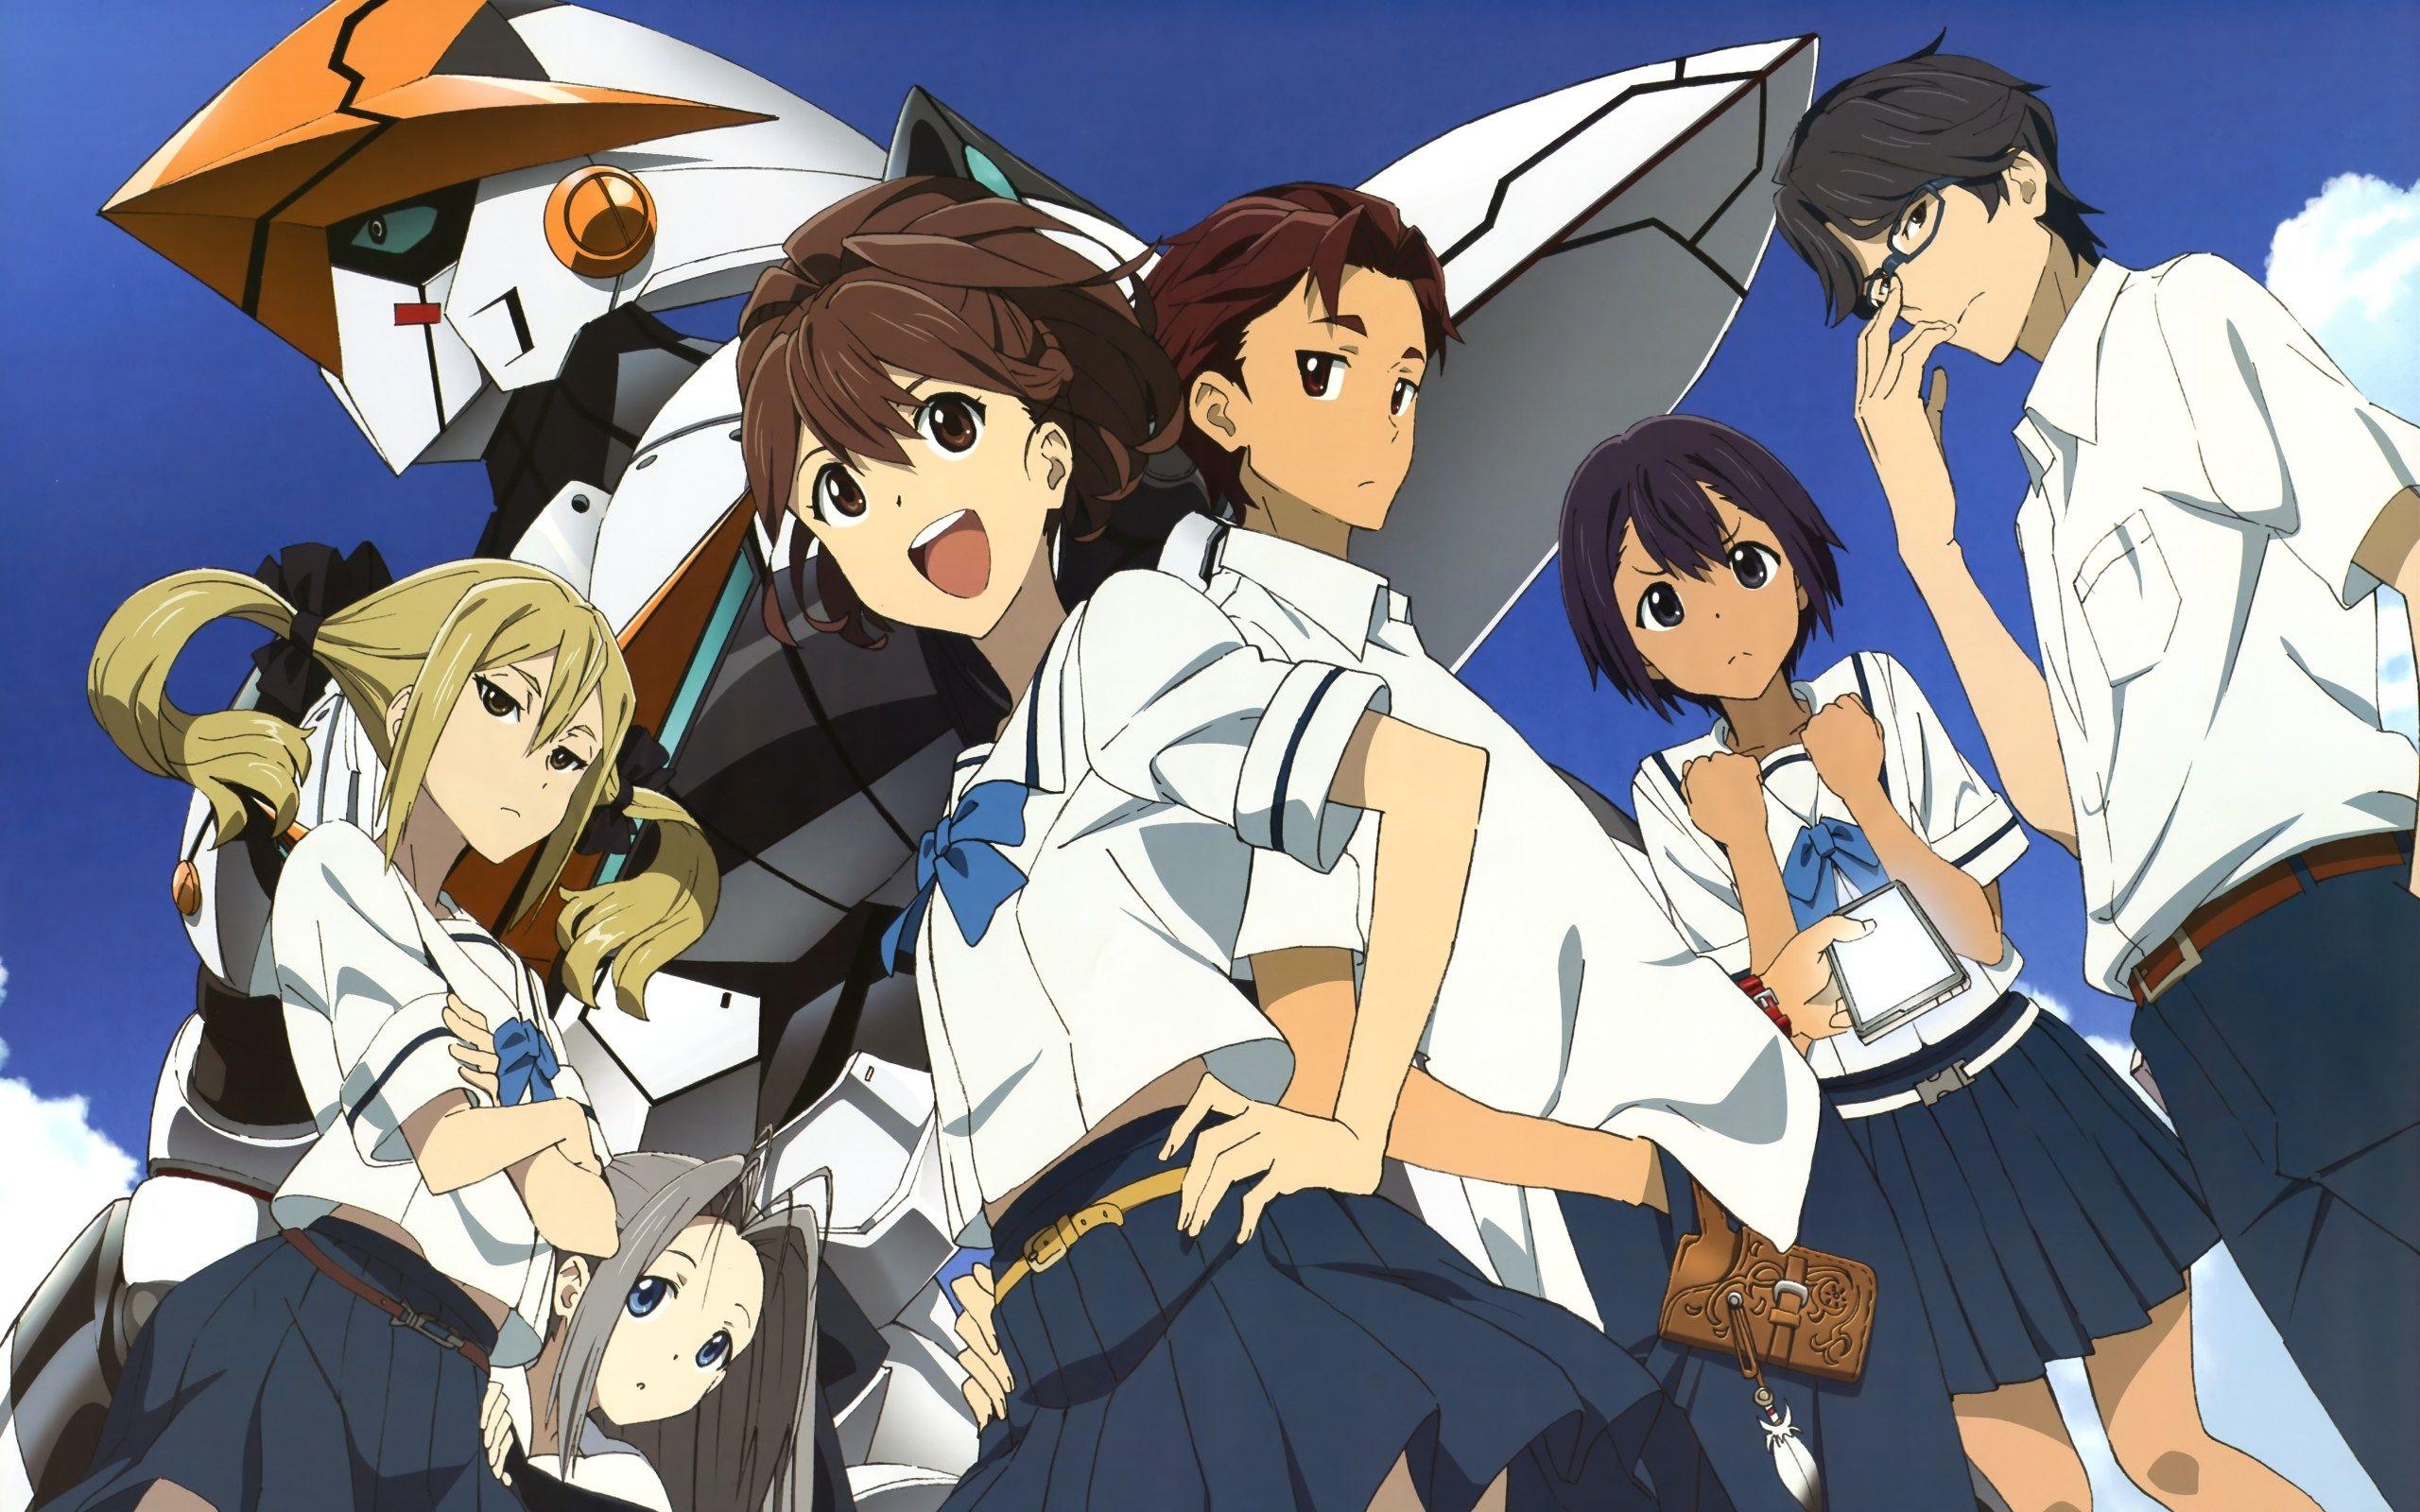 Robotics Notes 2 Romantic anime, Anime, Anime images